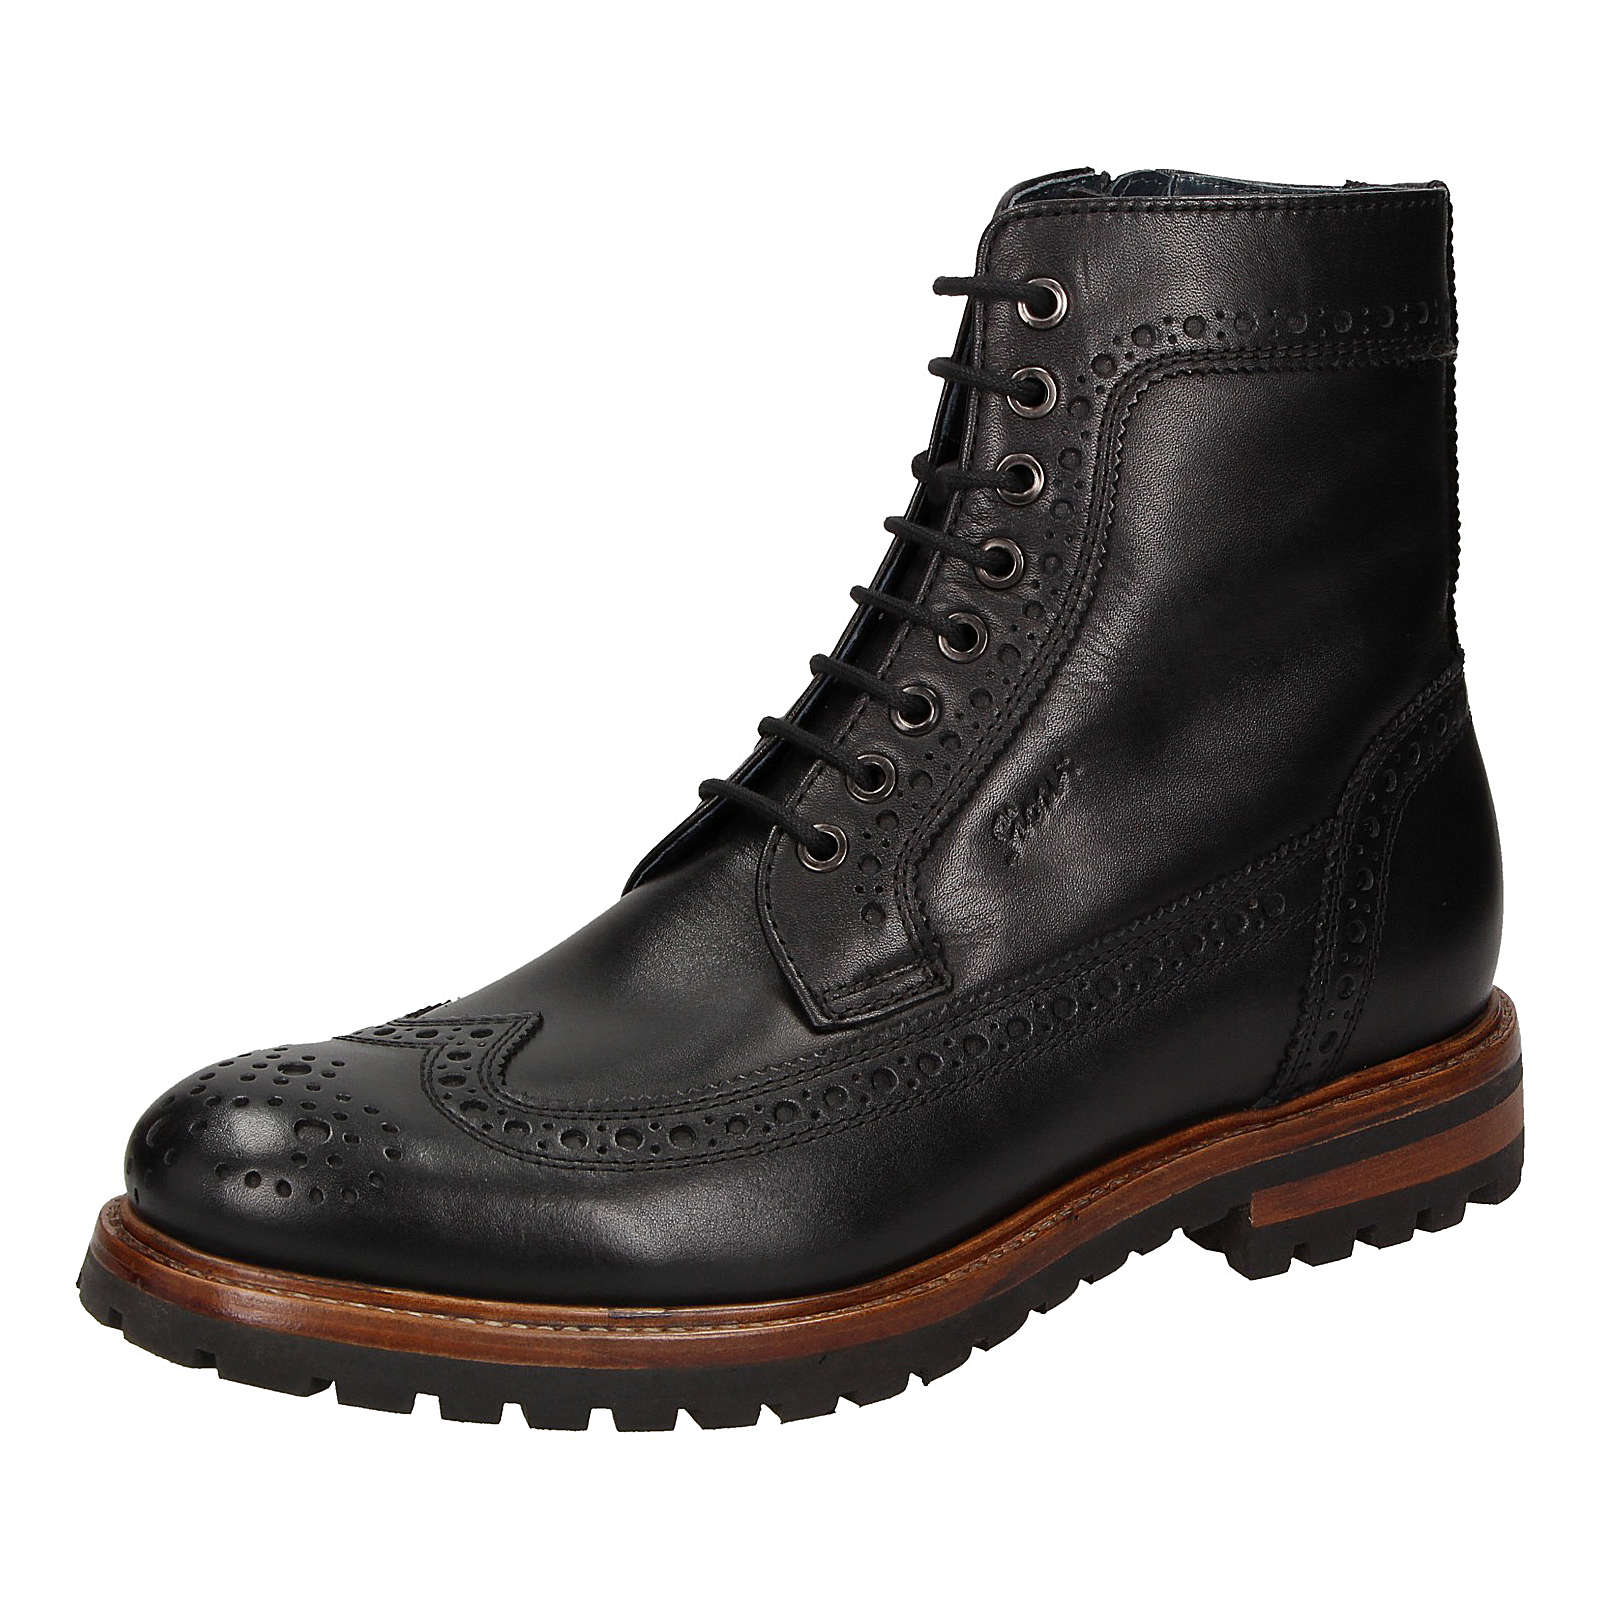 Sioux Klassische Stiefel Endreso schwarz Herren Gr. 46